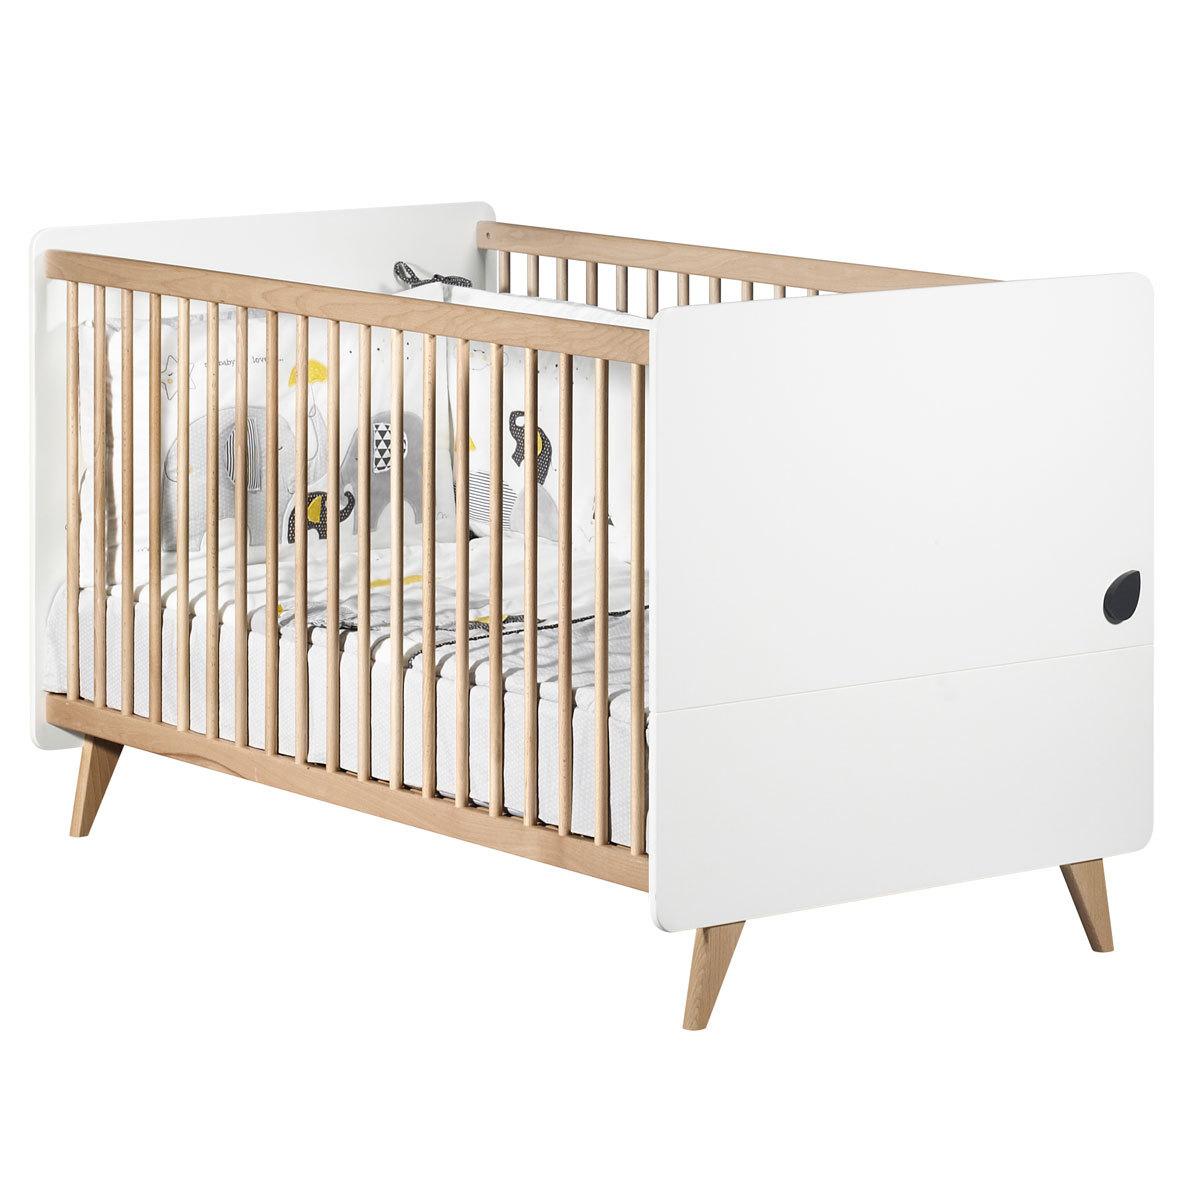 sauthon lit big bed oslo 140 x 70 cm lit b b sauthon. Black Bedroom Furniture Sets. Home Design Ideas